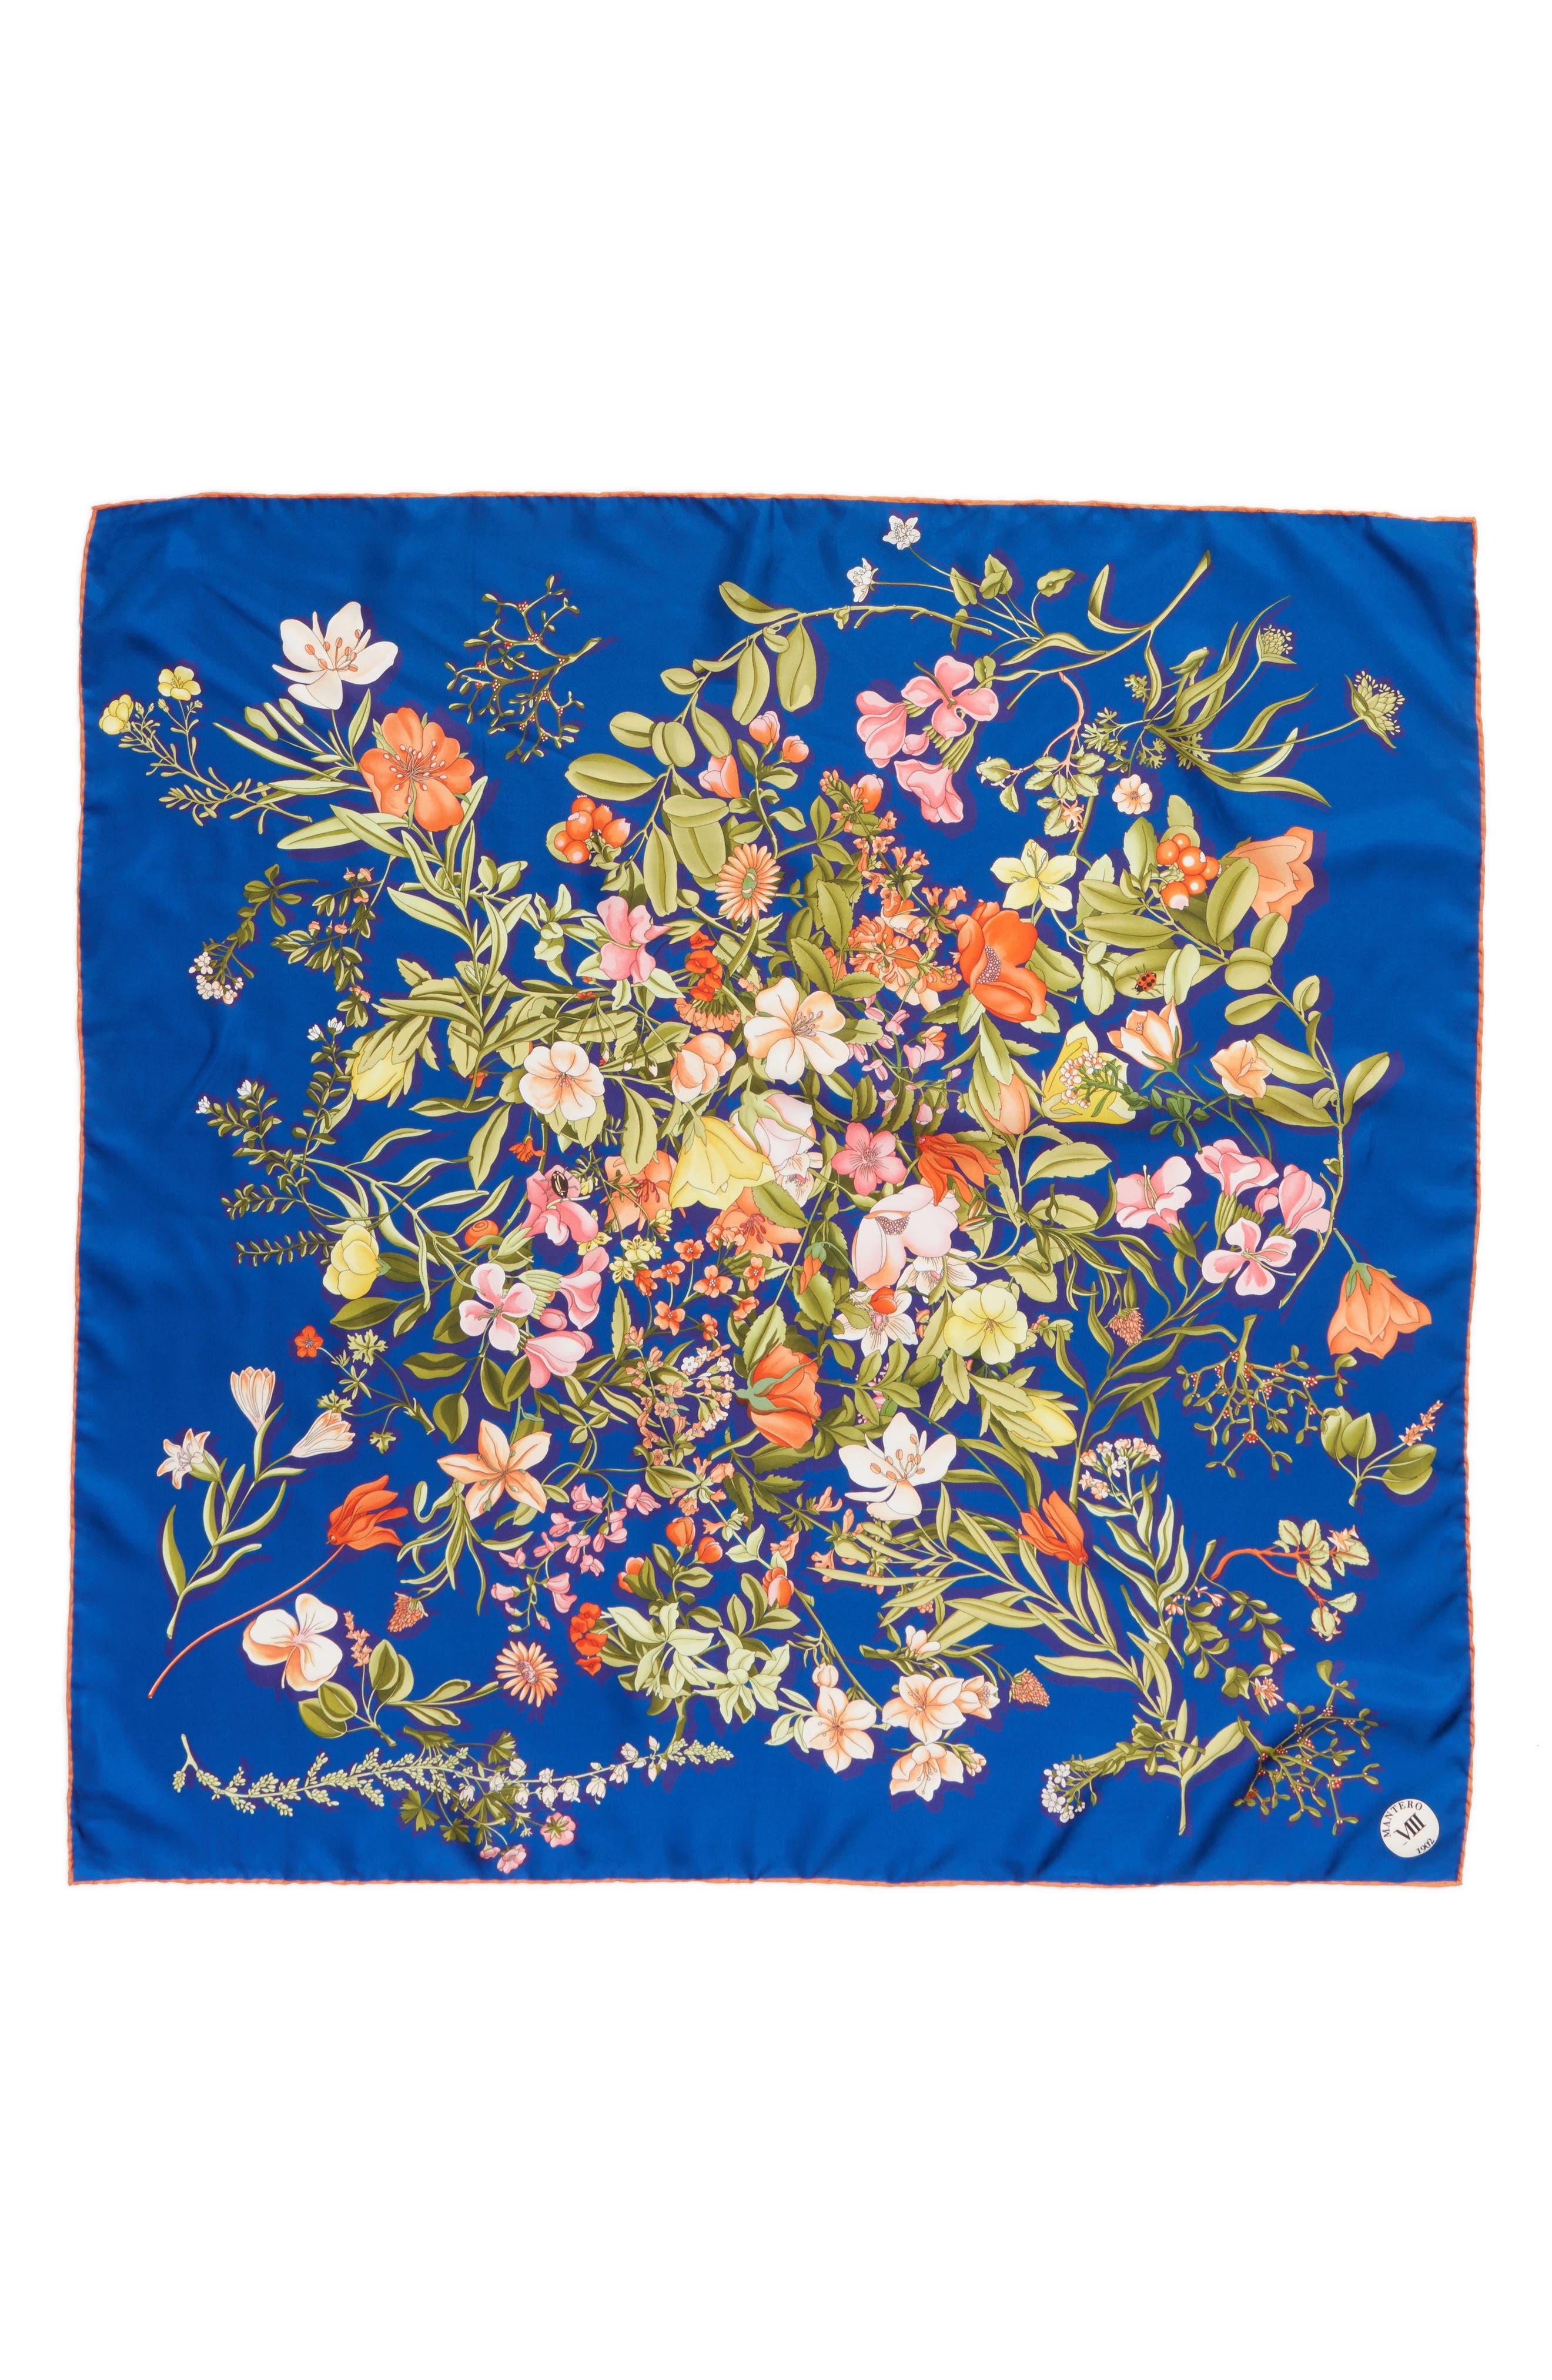 Alternate Image 1 Selected - MANTERO Archivio N.39 Square Silk Scarf